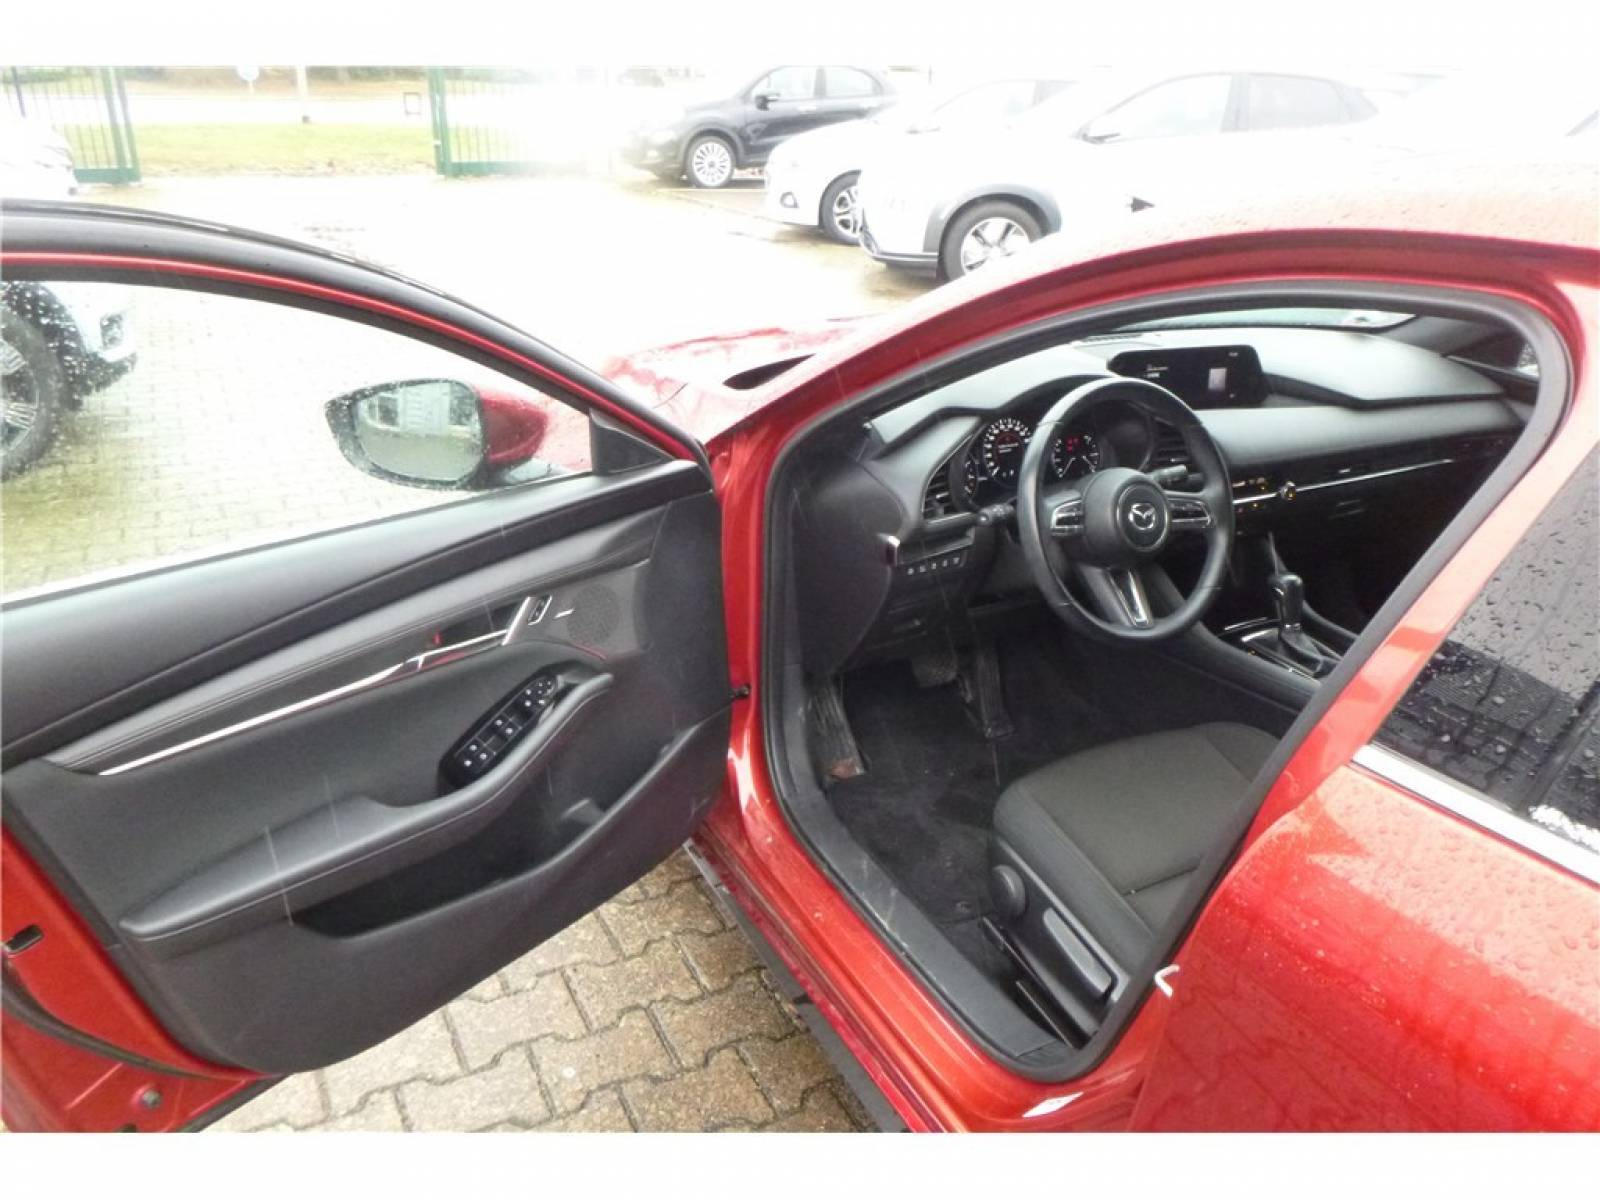 MAZDA Mazda3 5 portes 2.0L SKYACTIV-G M Hybrid 122 ch BVA6 - véhicule d'occasion - Groupe Guillet - Chalon Automobiles - 71100 - Chalon-sur-Saône - 11